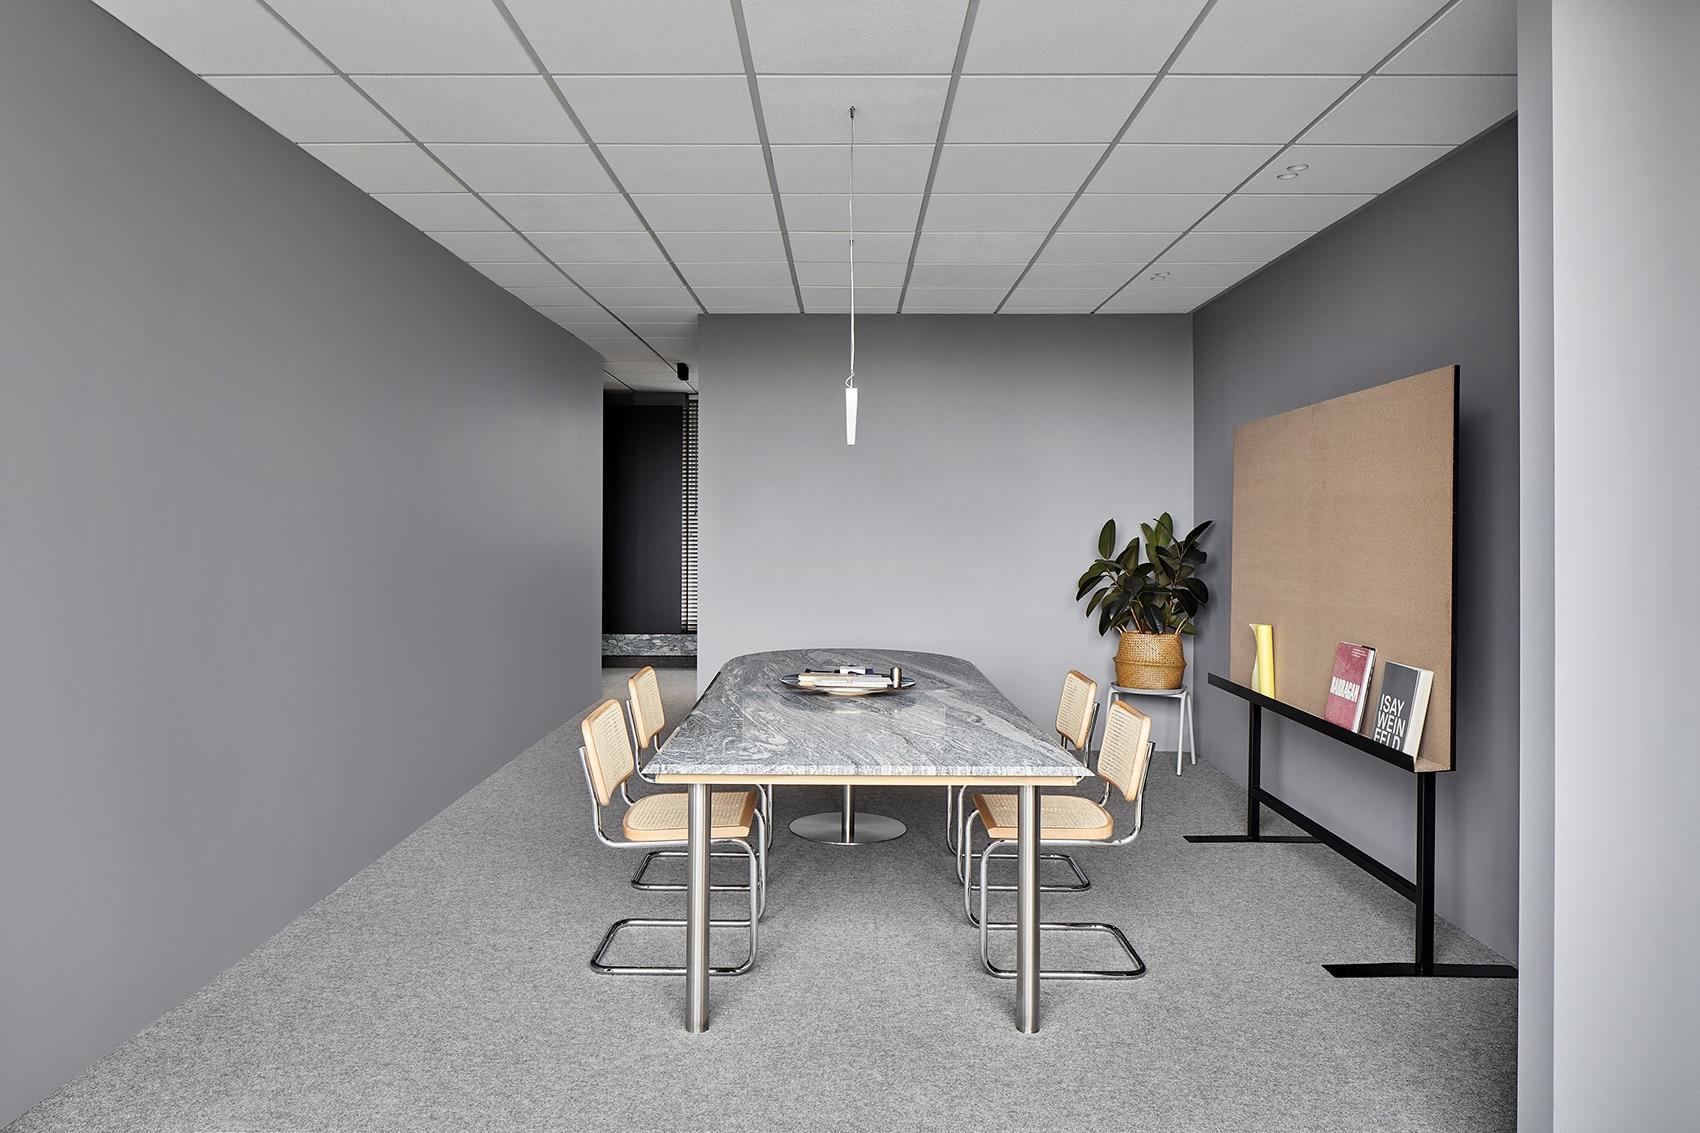 davidov-architects-studio-office-10